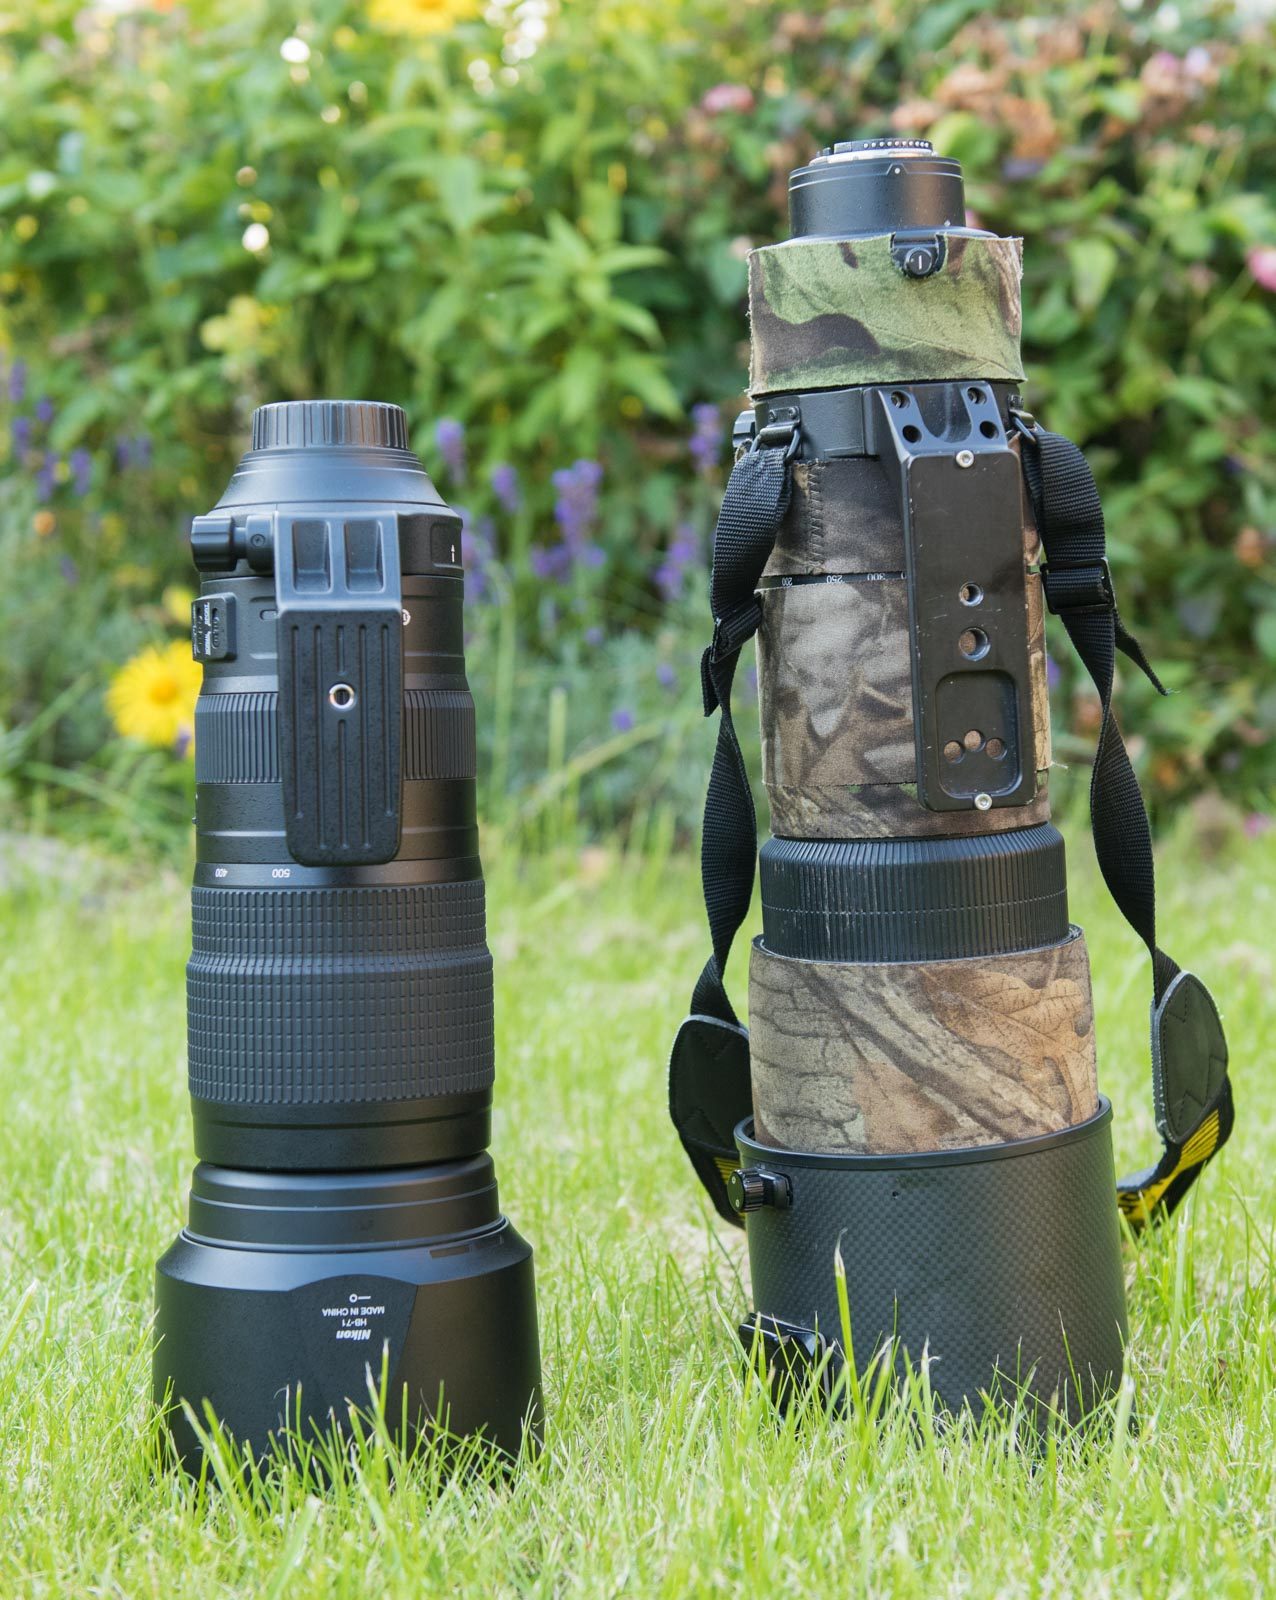 nikon 200-500mm review wildlife